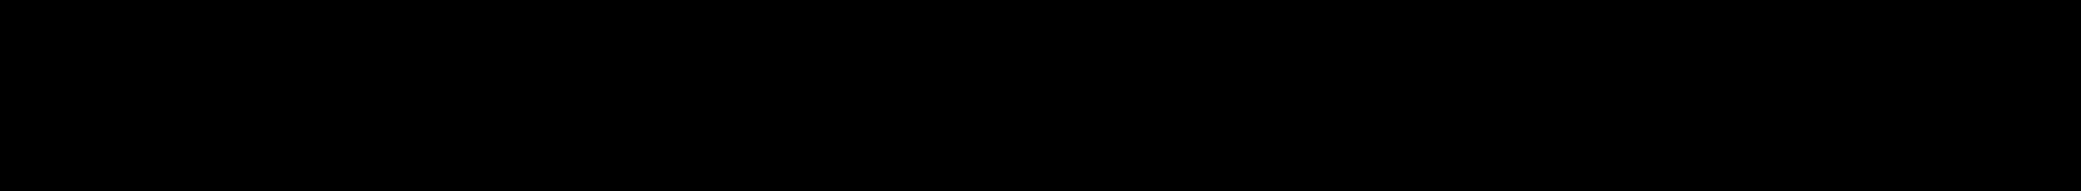 Design System G 300R